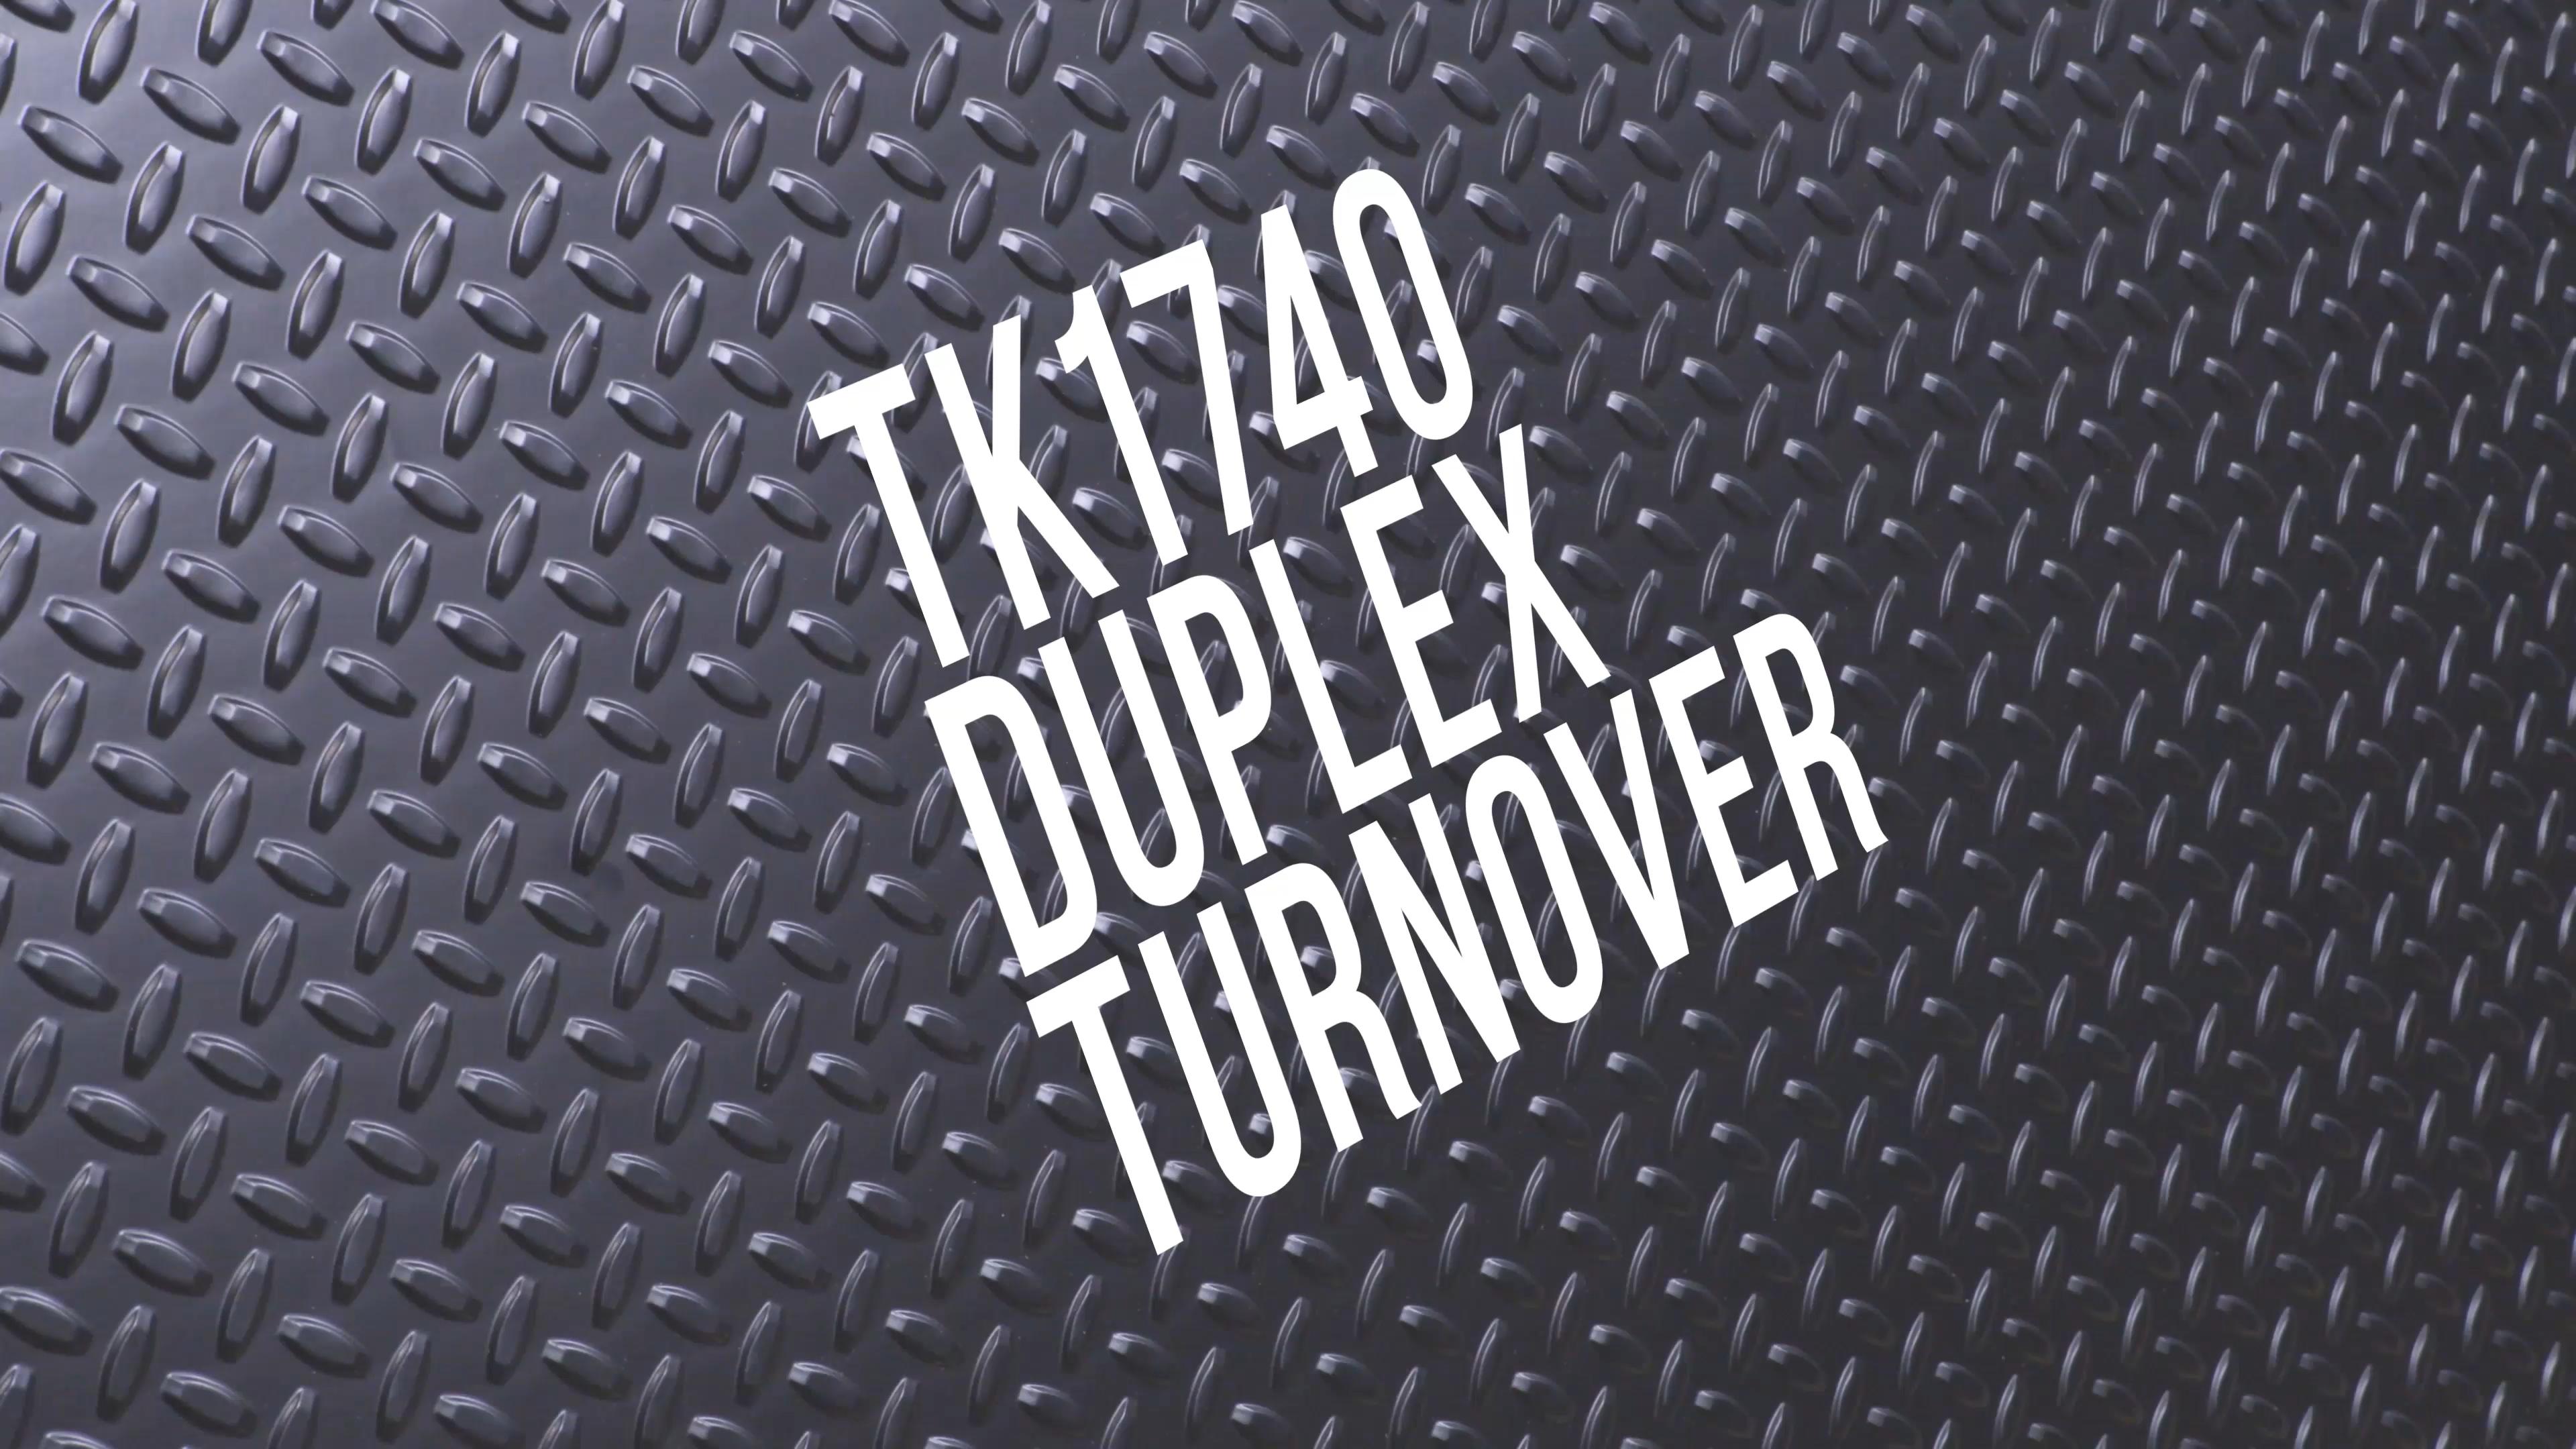 TK1740 Duplex Turnover